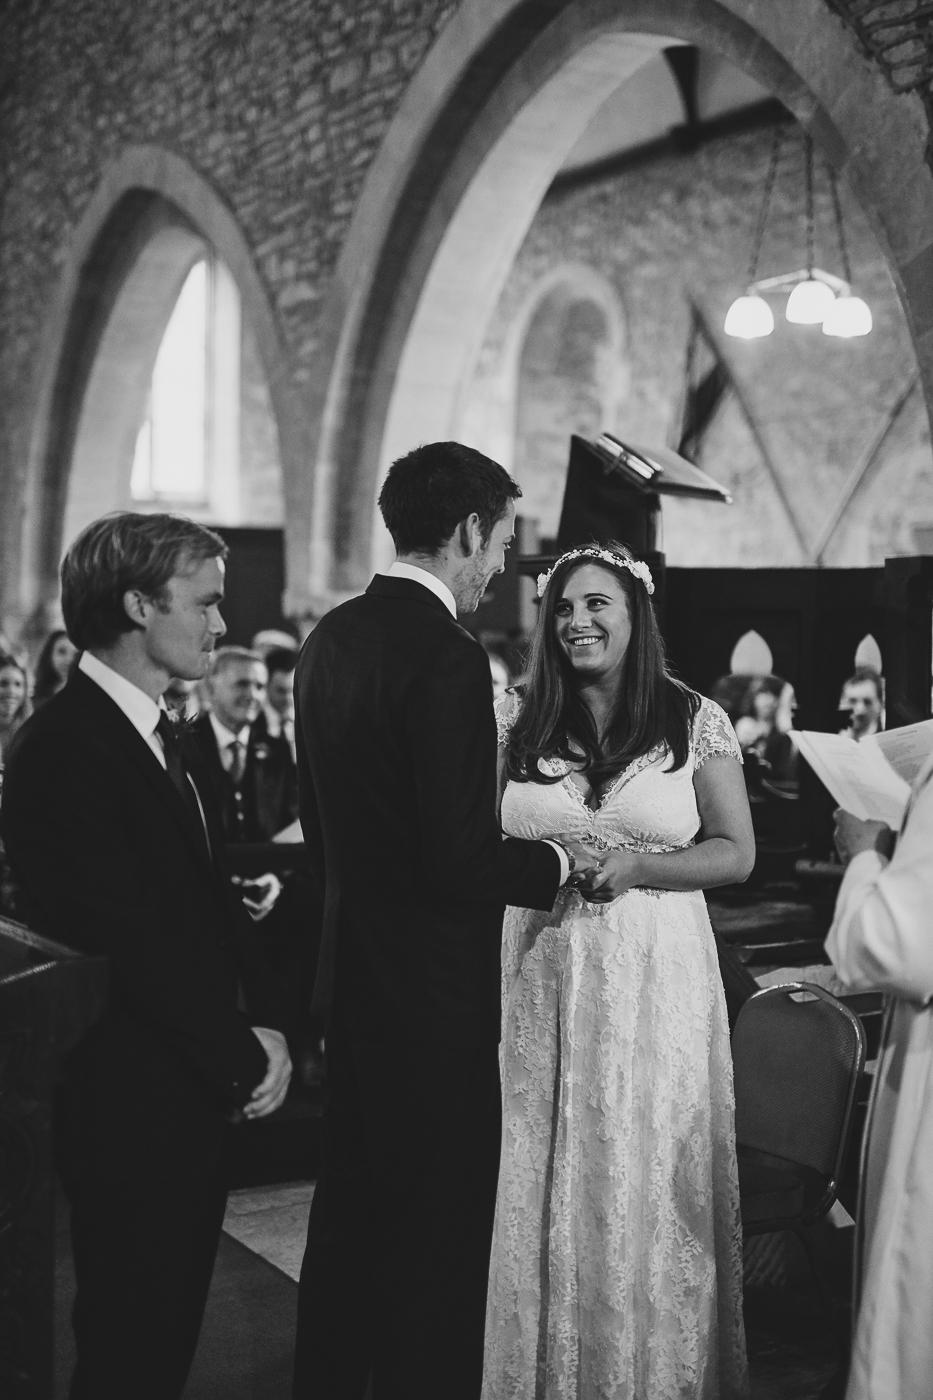 Danni_And_Jack_Gloucester_Wedding-70.jpg